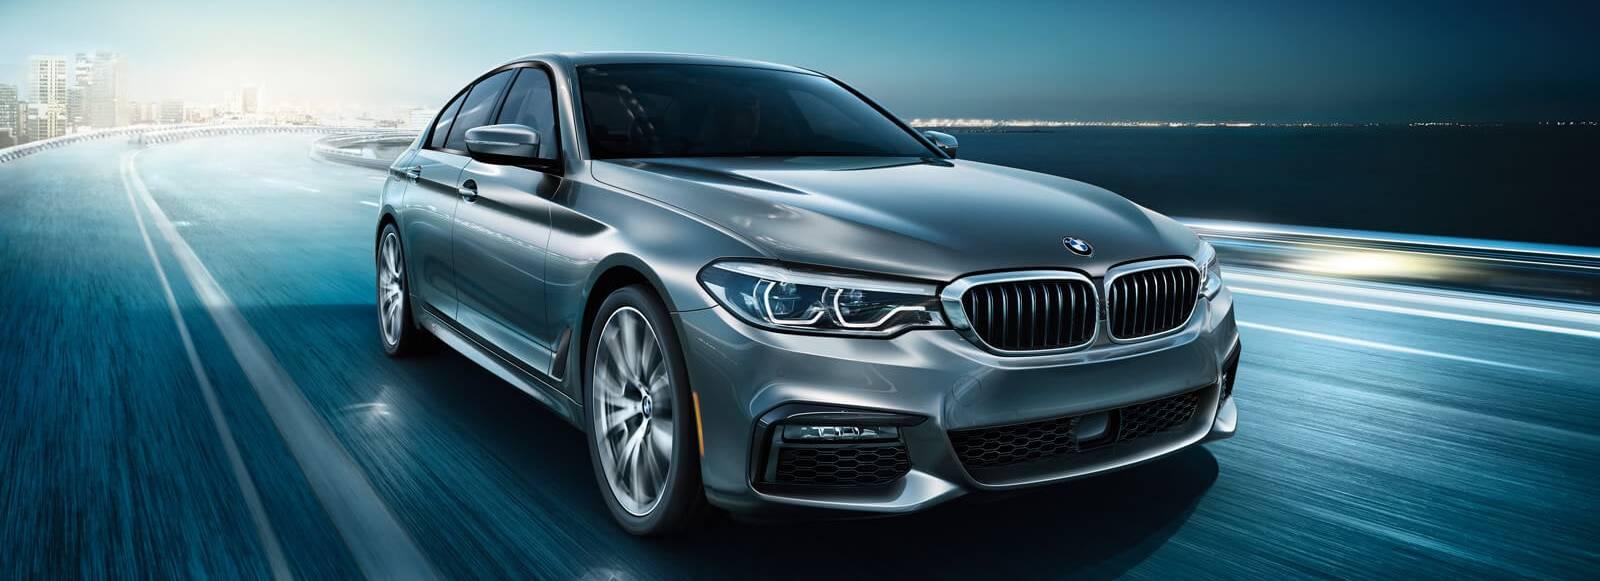 2020 BMW 5 Series Leasing near Dallas, TX